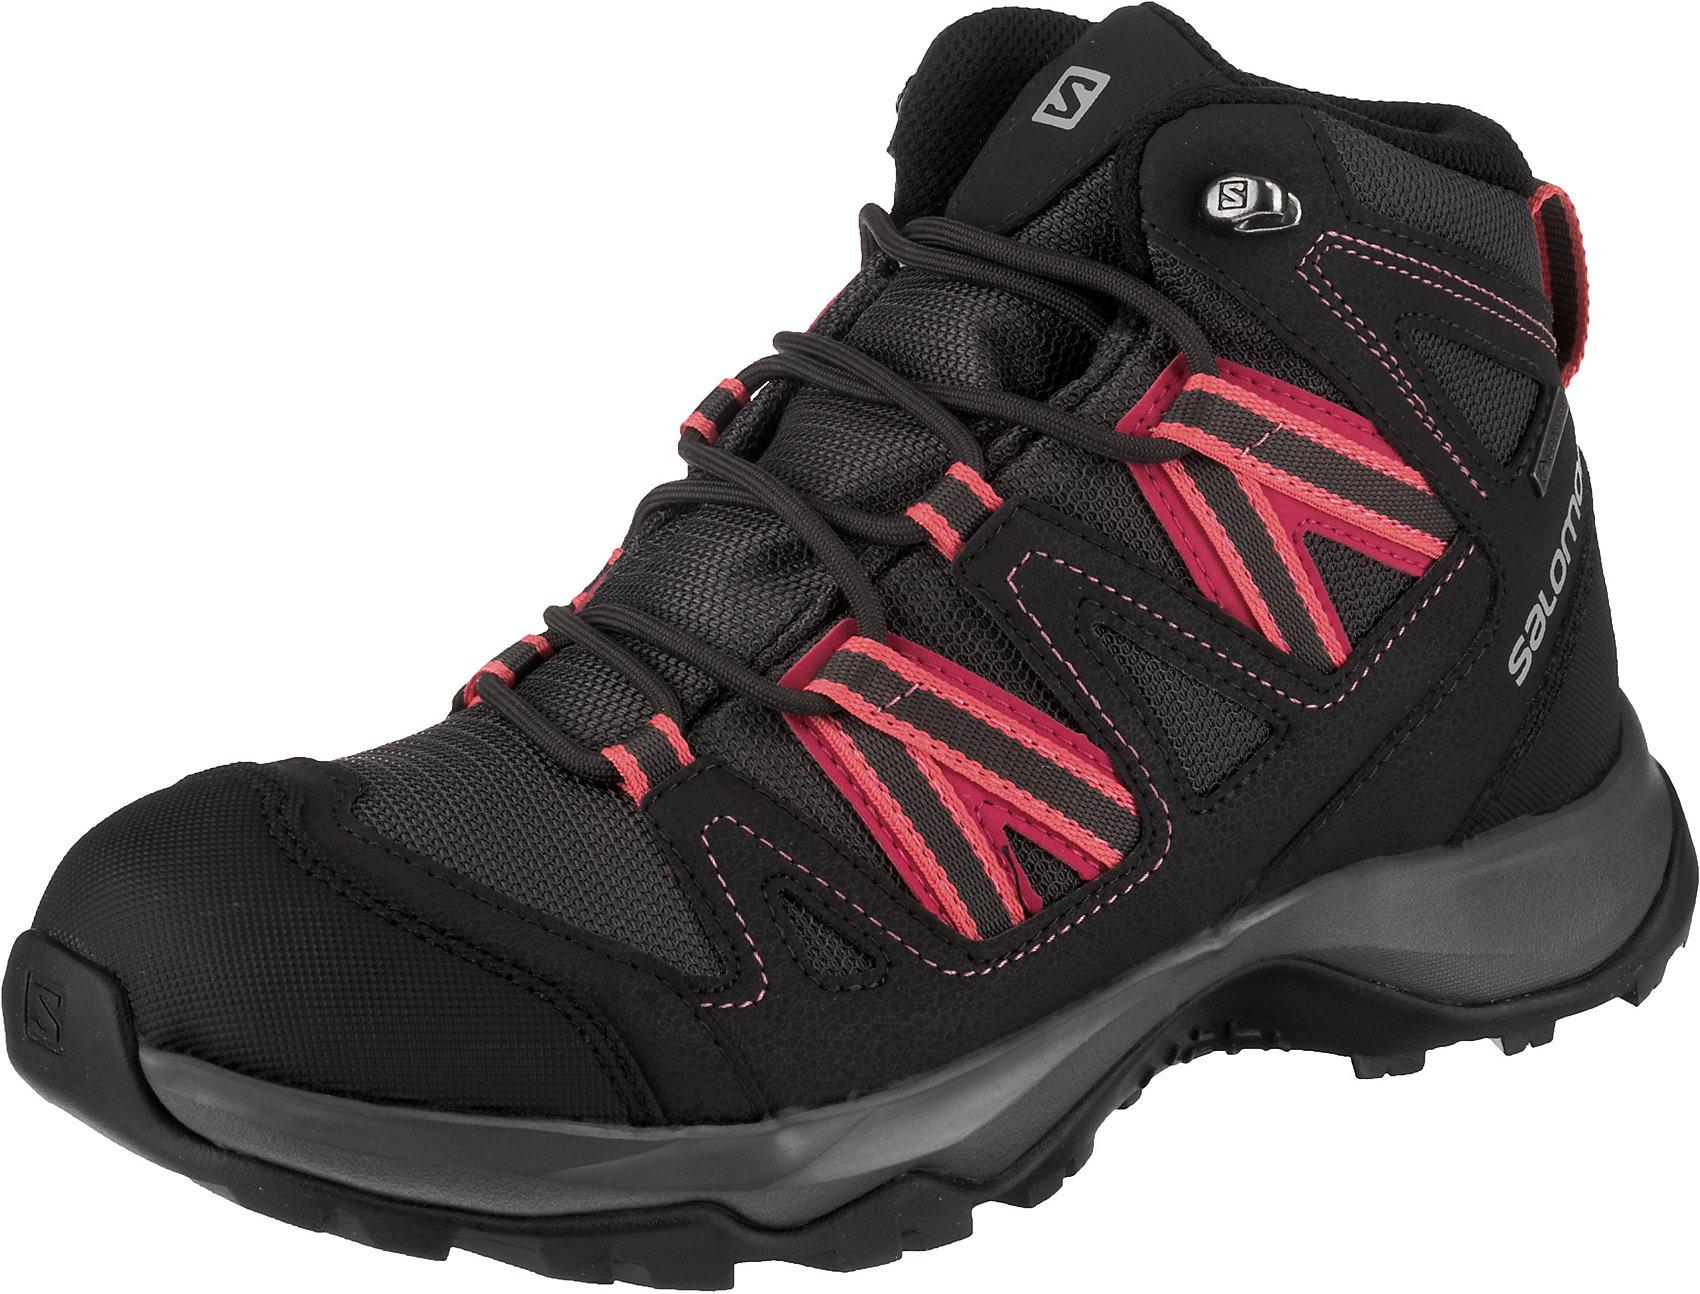 Salomon Tibai Mid GTX W Outdoor Wanderschuhe Damen Stiefel Women Schuhe 399259